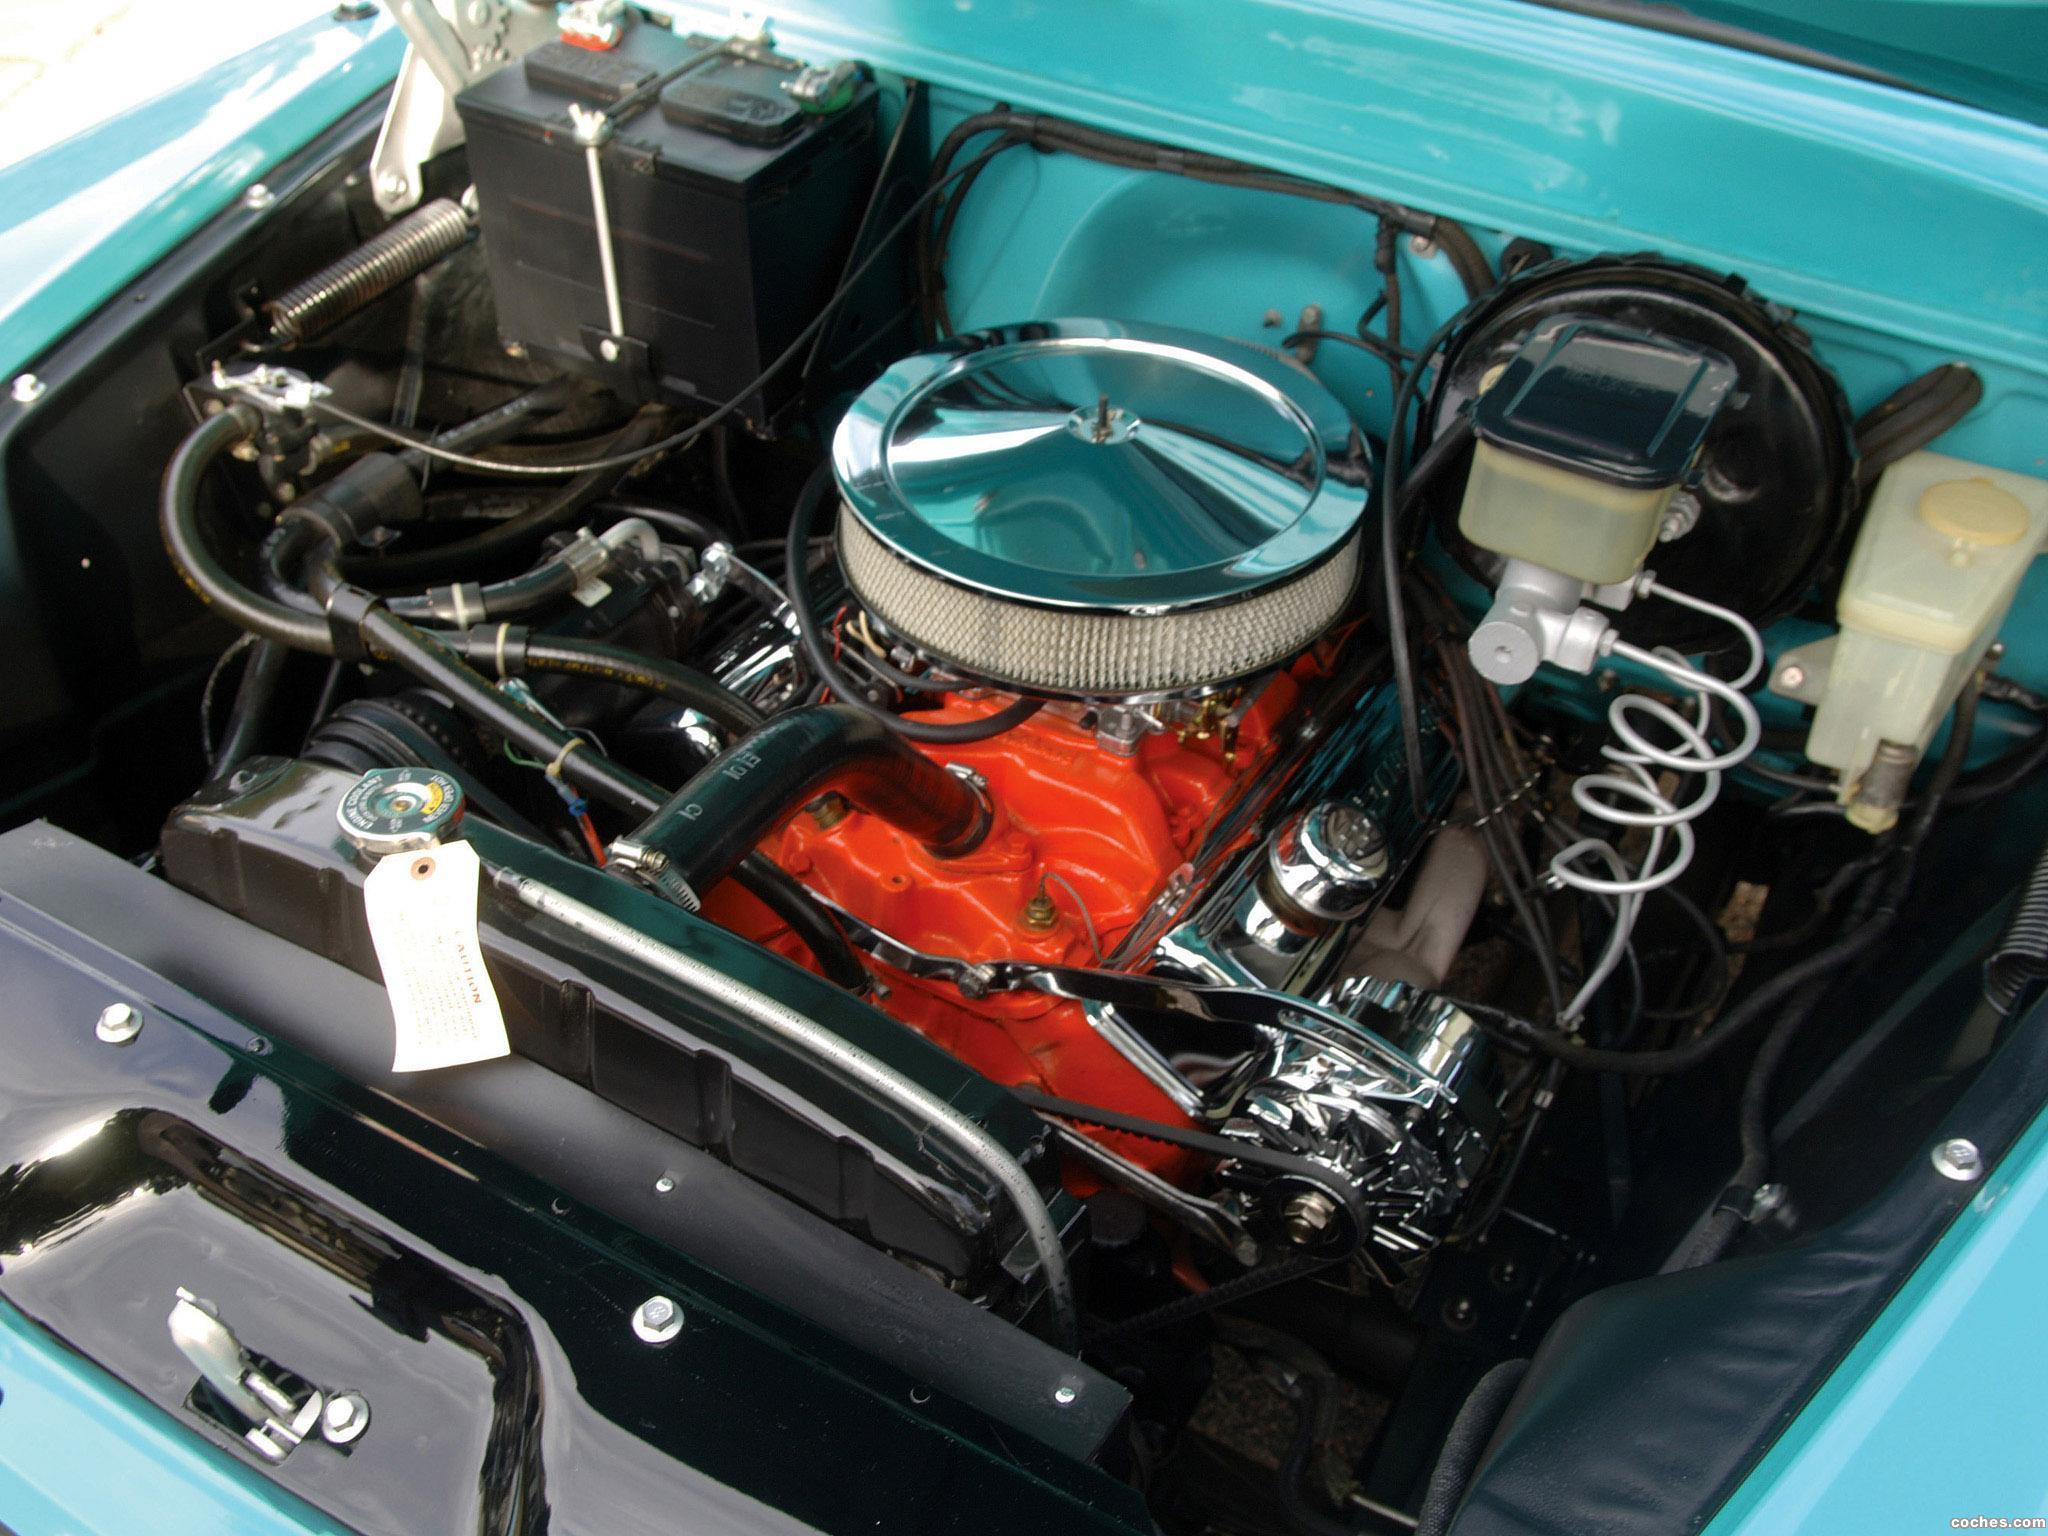 Chevrolet Apache 3100 pickup: Photos, Reviews, News, Specs